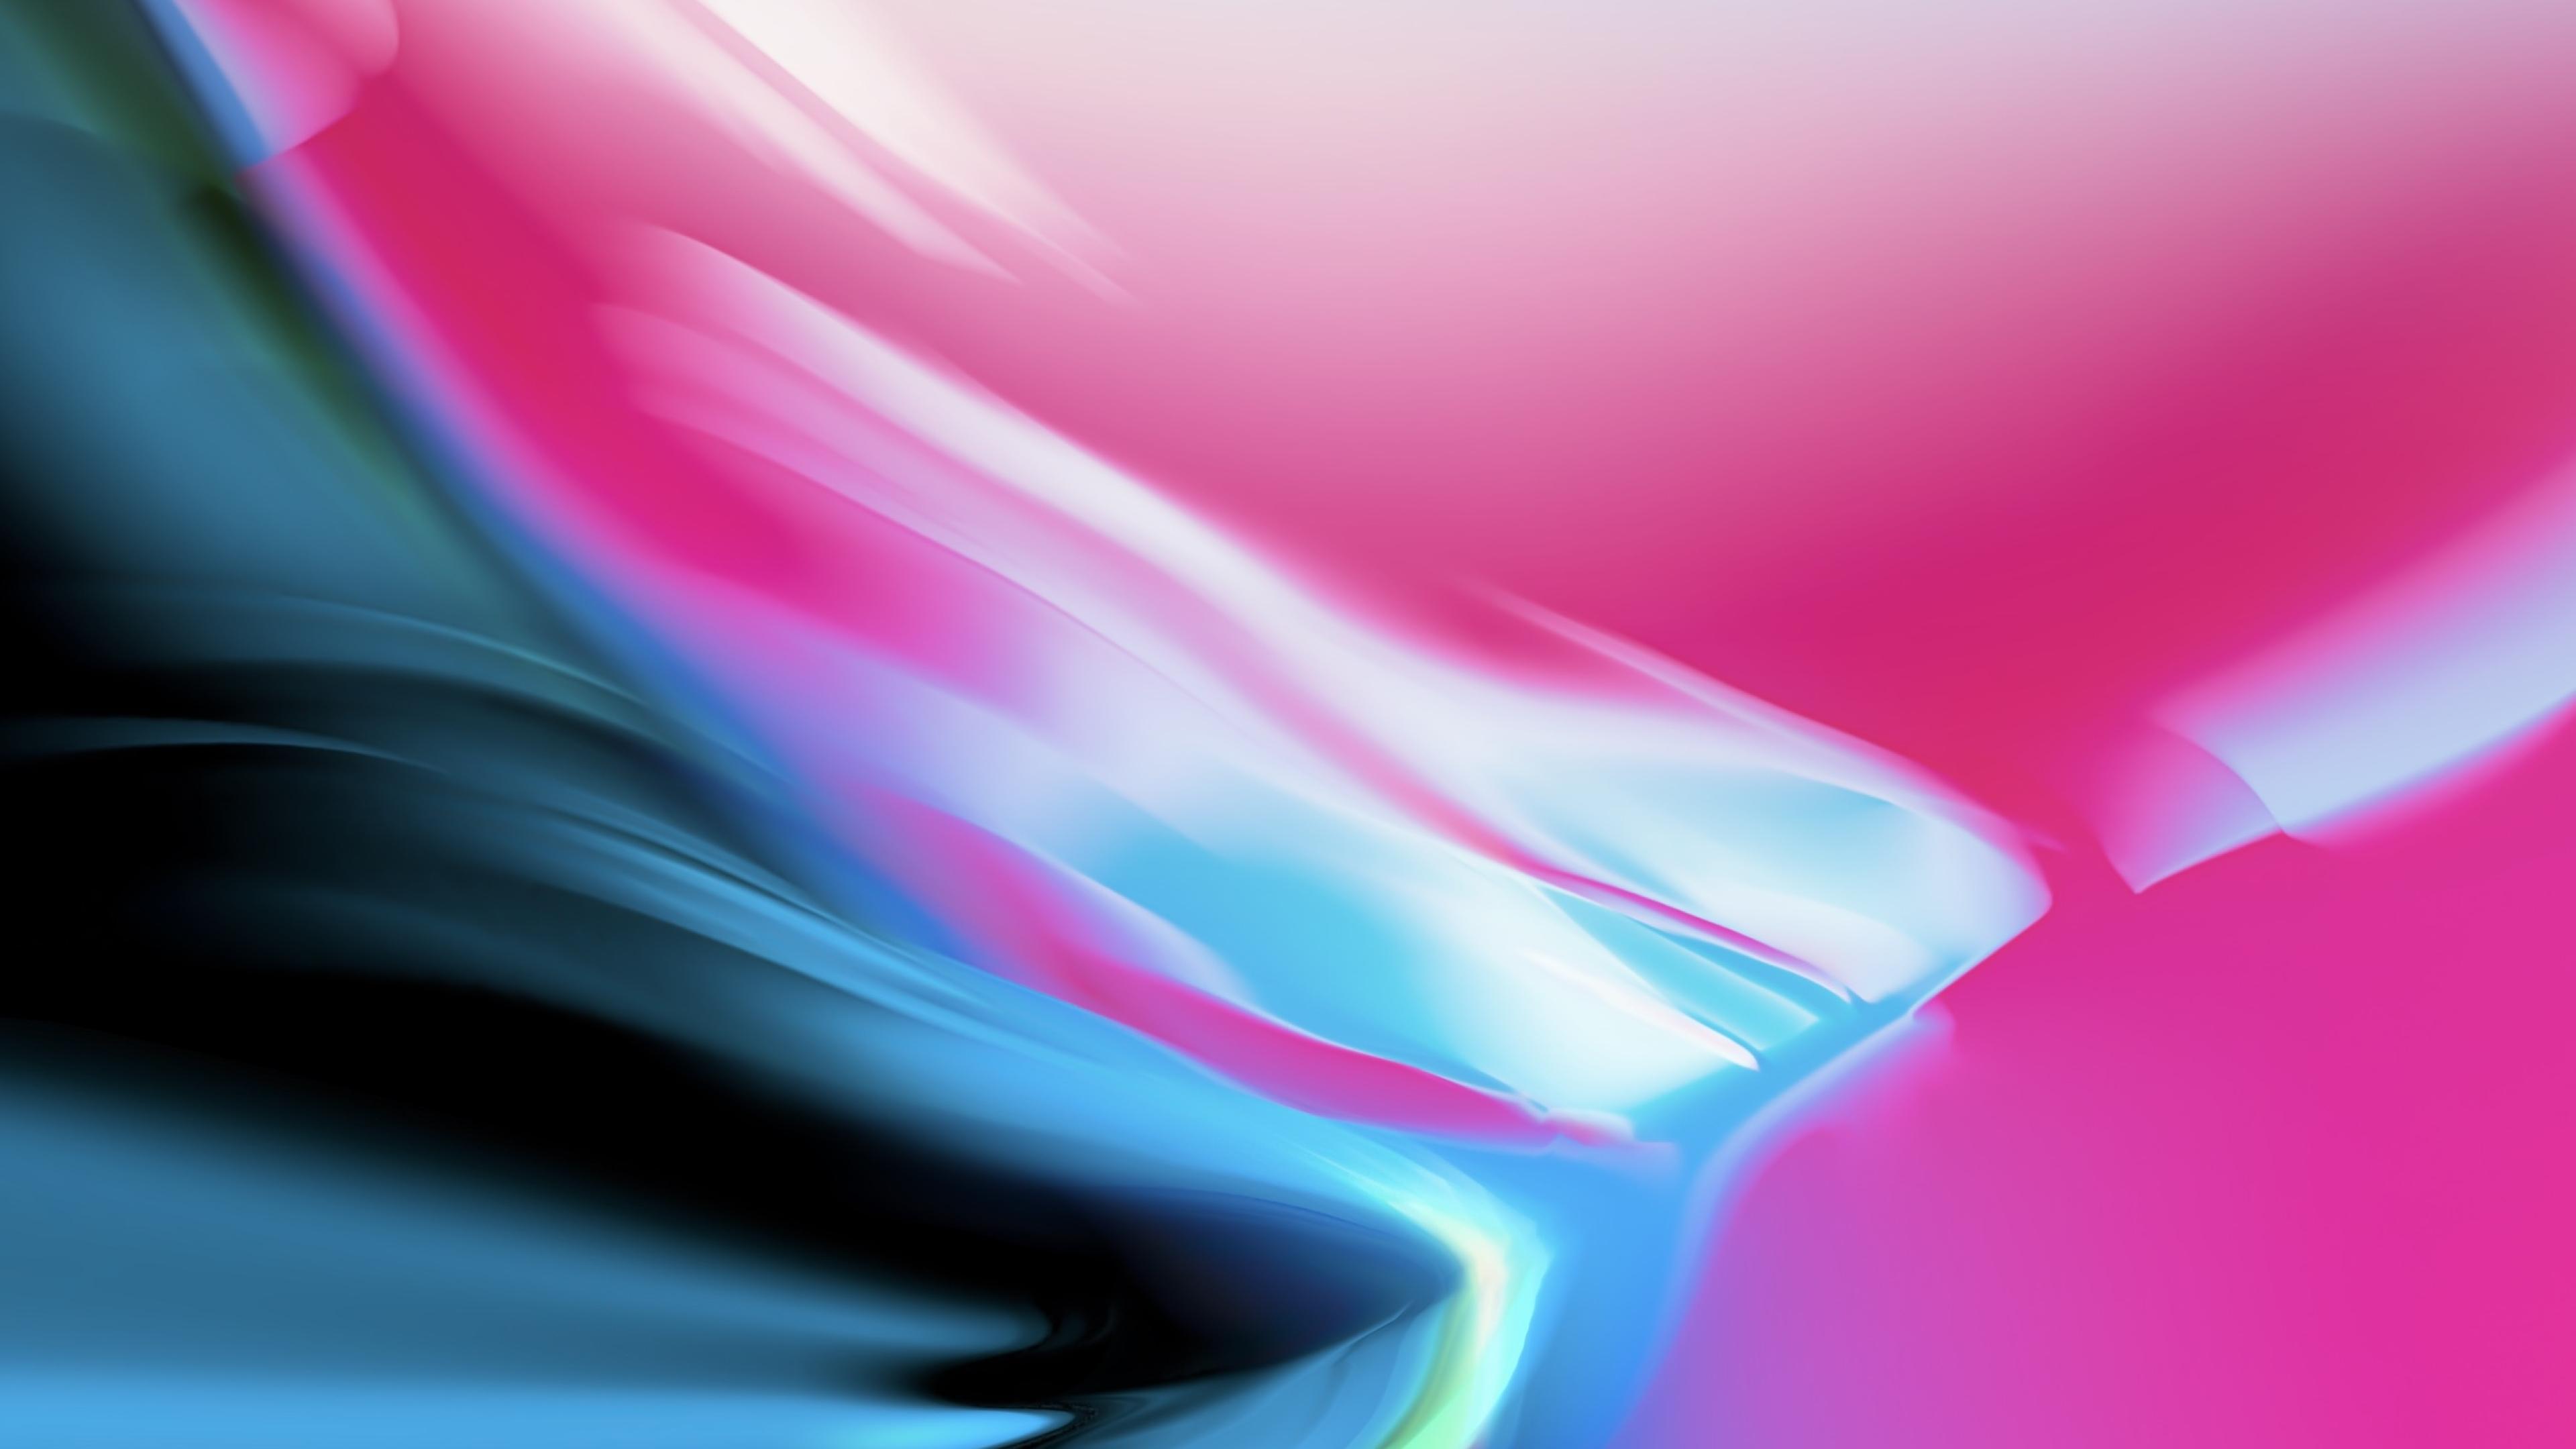 Download Galaxy Note 5 Galaxy S6 Edge Full Hd Stock: Ios 11 Aura Silver Granite, Full HD 2K Wallpaper